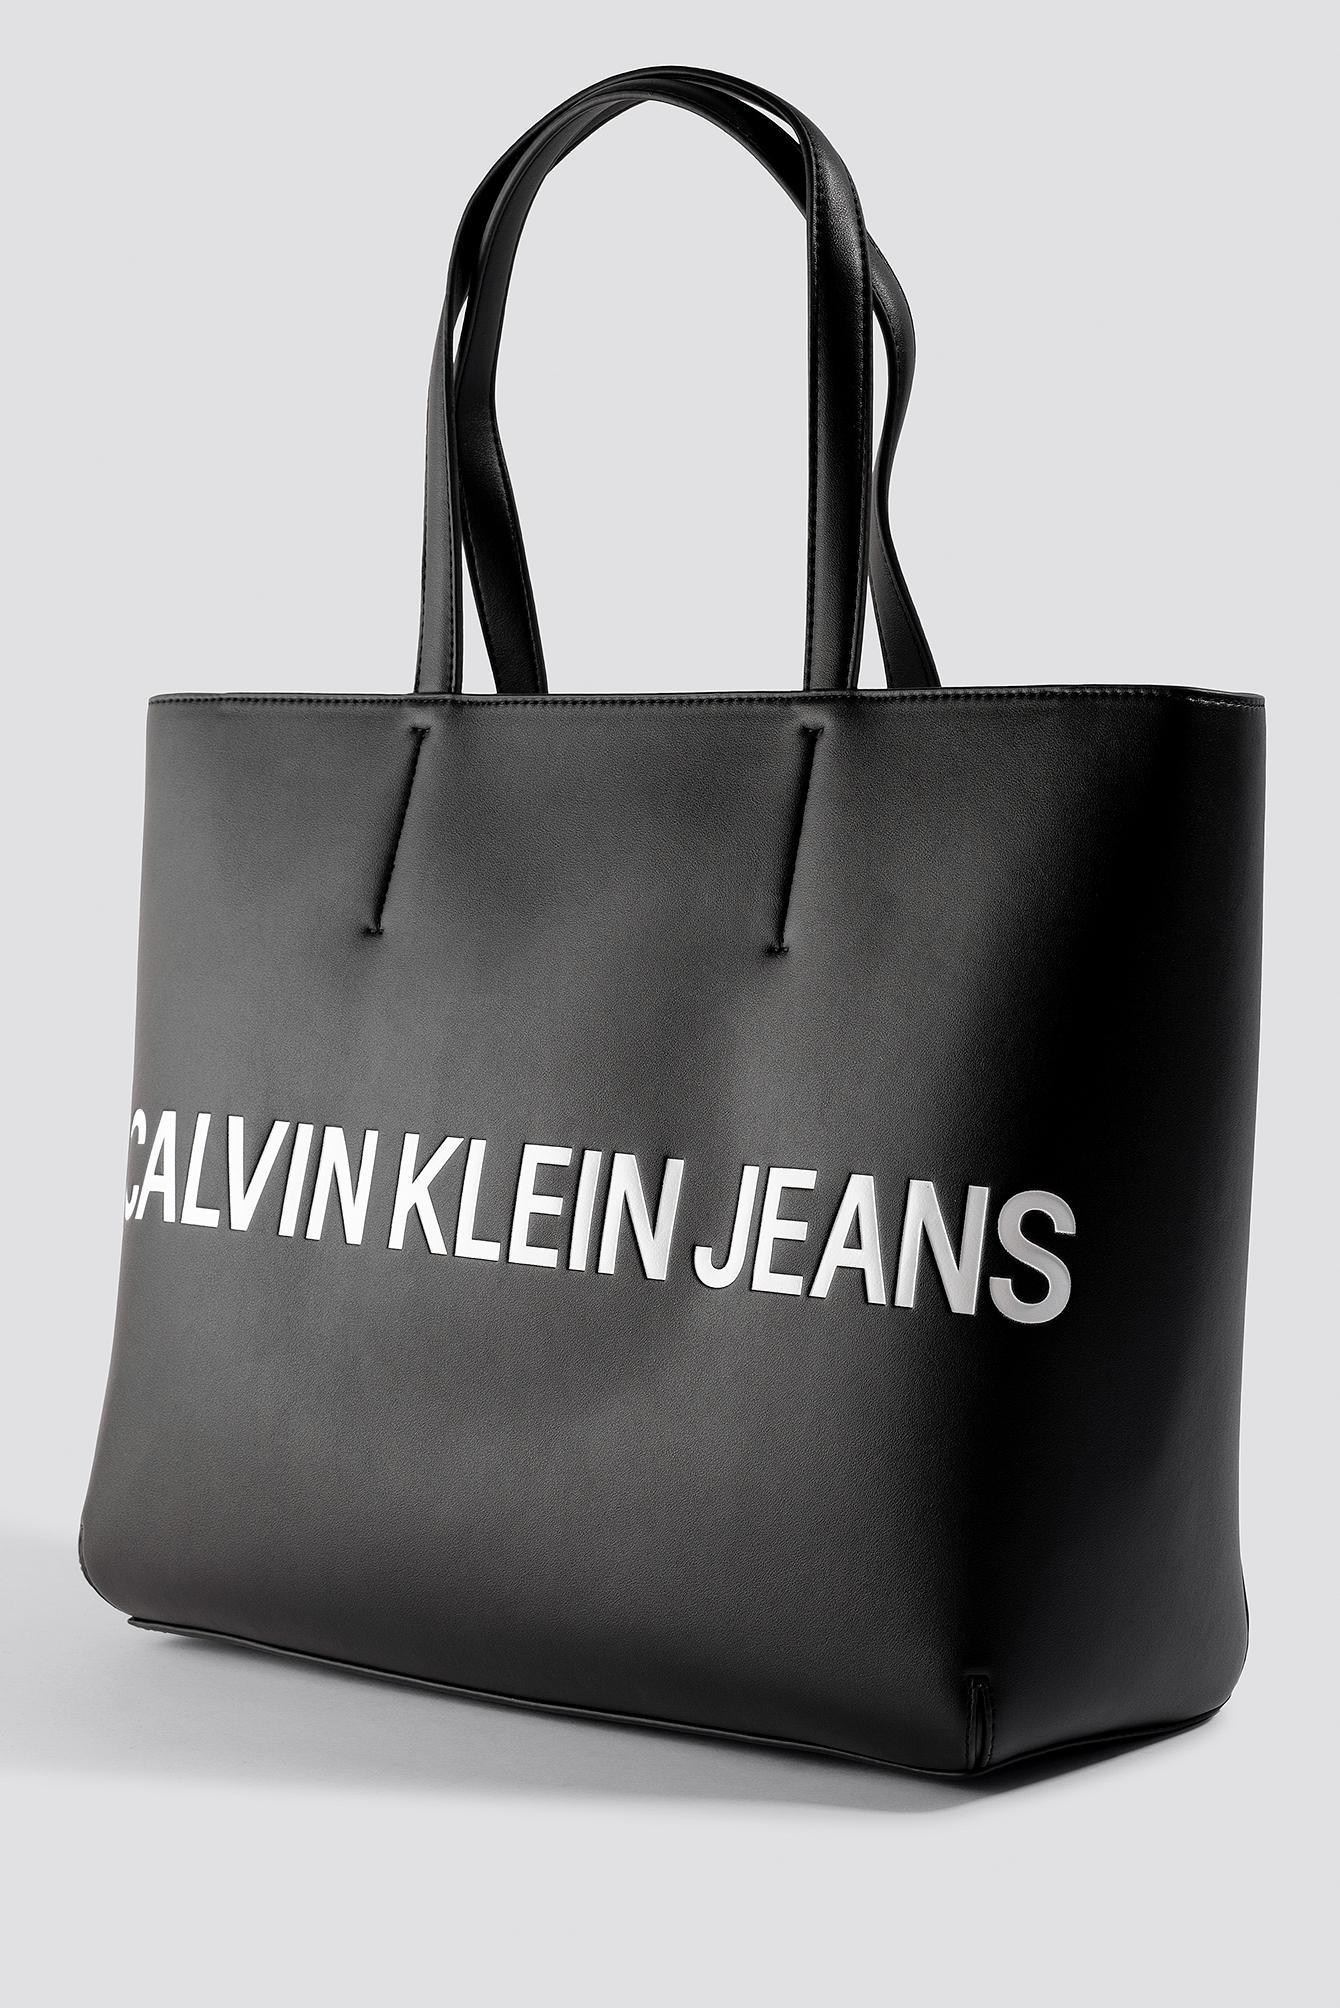 Lyst - Calvin Klein Sculpted Logo Tote Bag Black in Black f2c2bd45a24